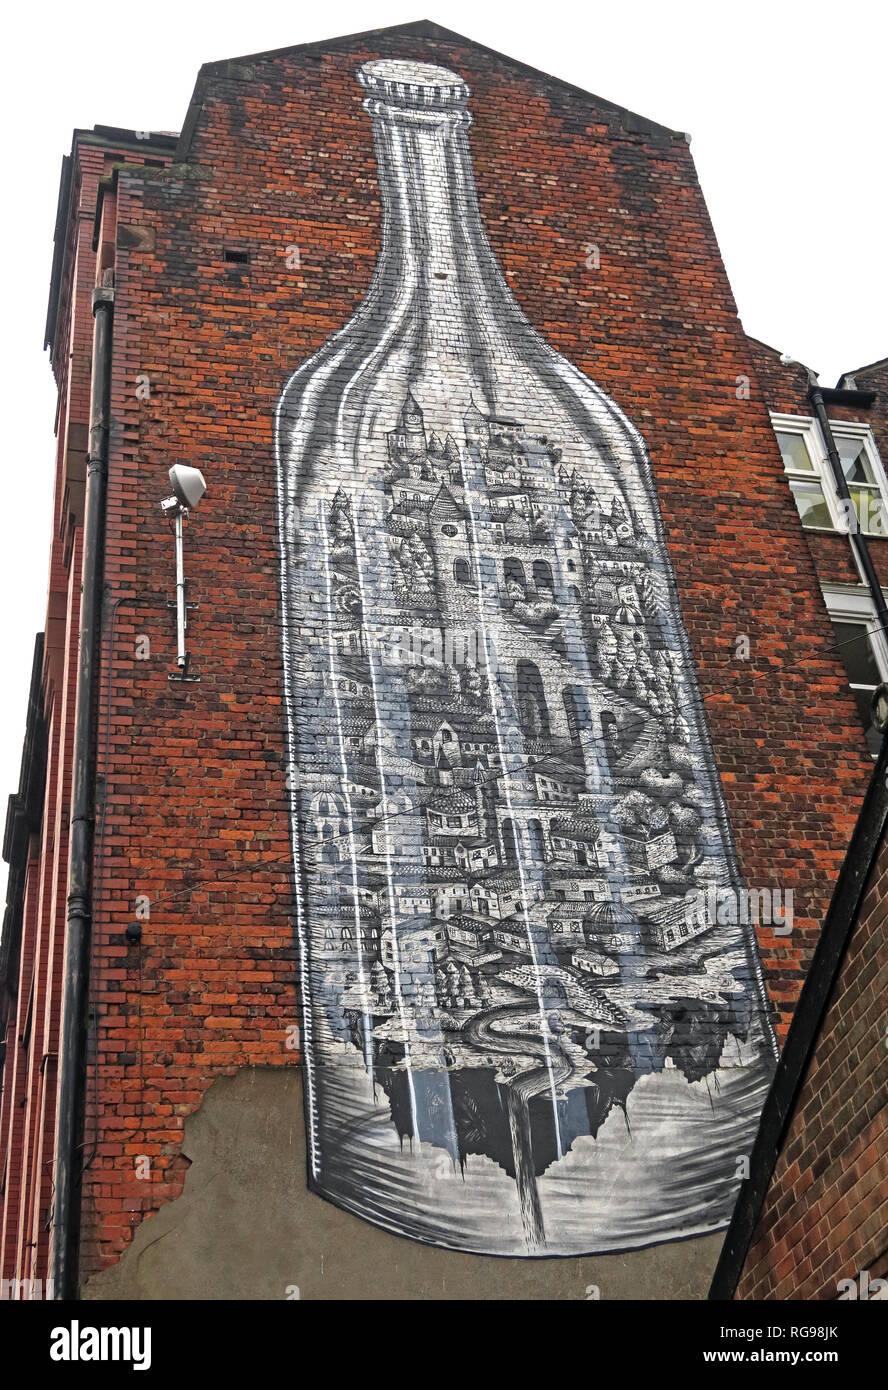 Laden Sie dieses Alamy Stockfoto Esher Kunst Flasche, Cross Keys St, Manchester NQ4, North West England, UK, M 4 5 ET - RG98JK